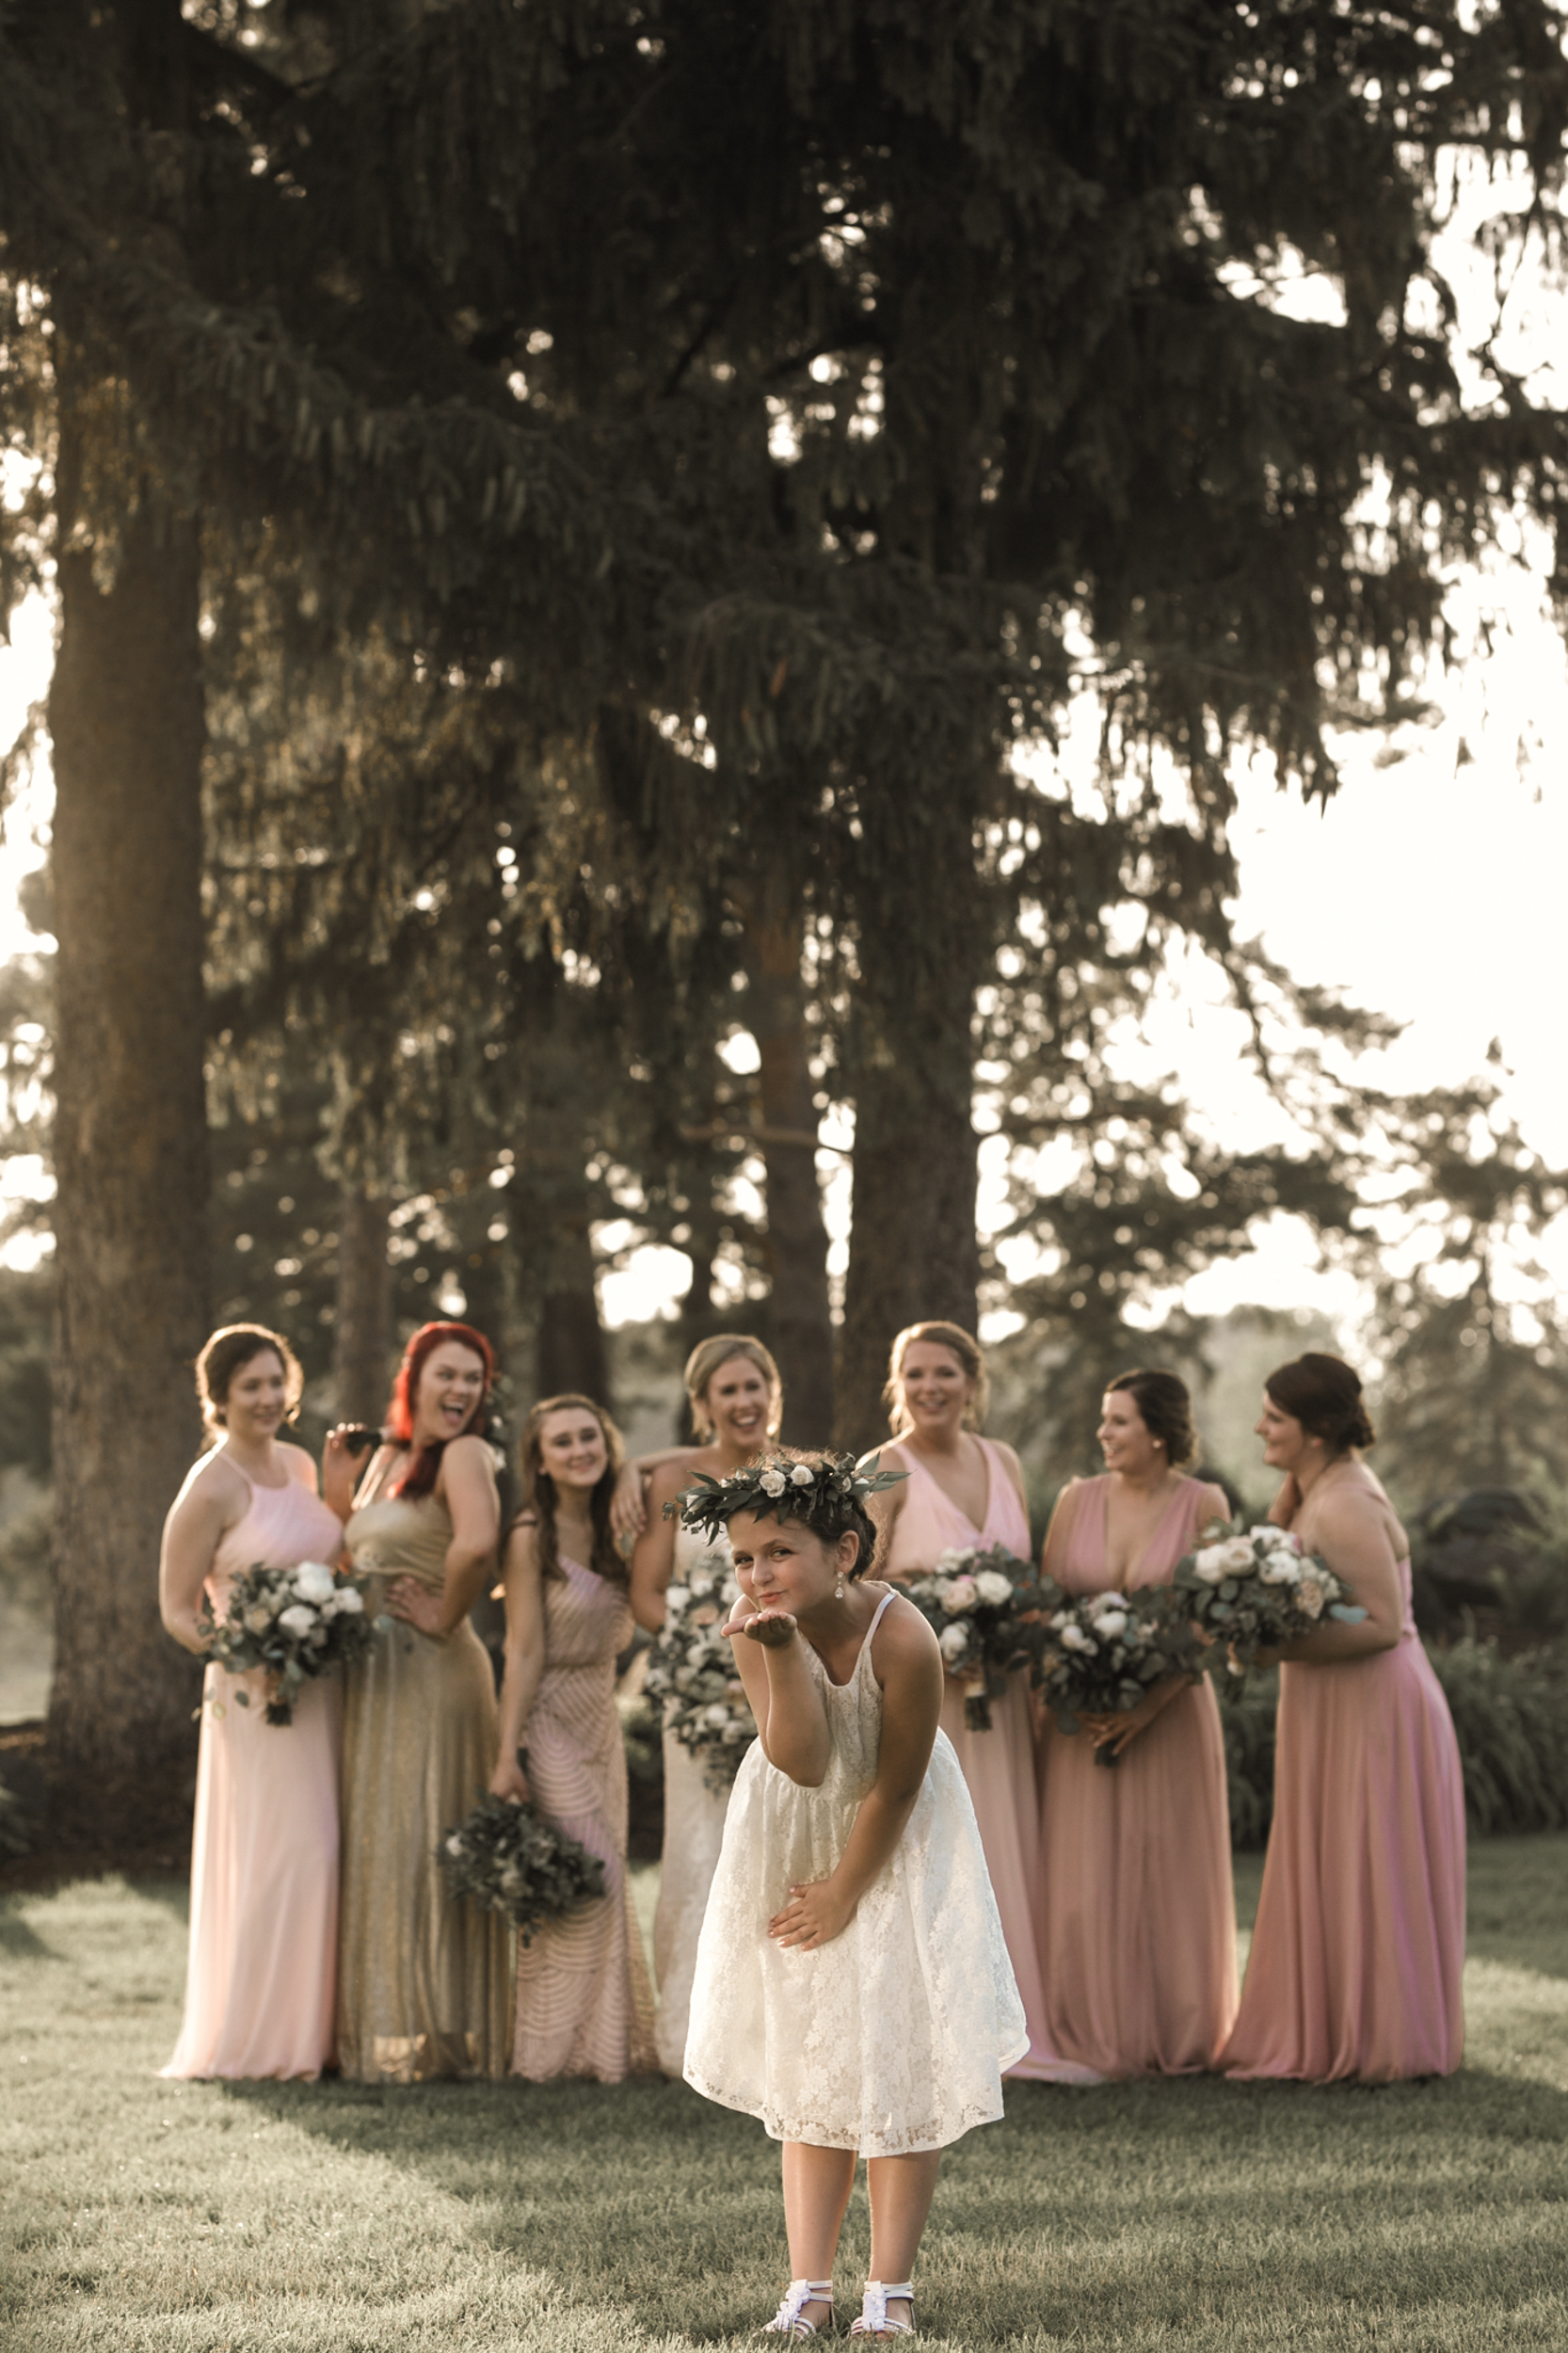 wedding-photography-dark-moody-rustic-details-20.jpg